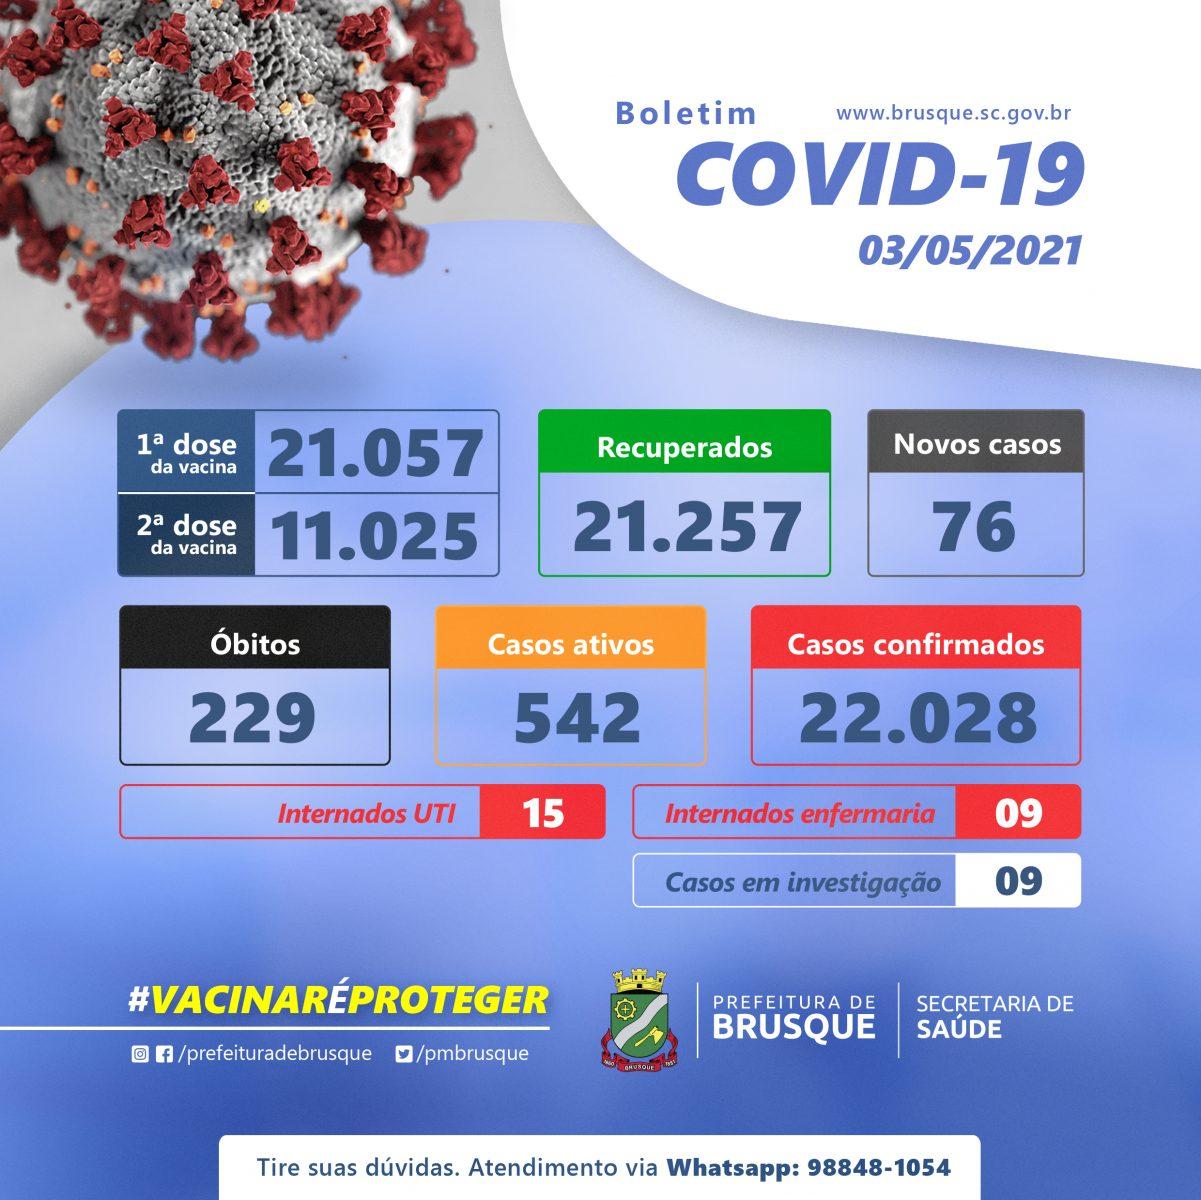 Covid 19: Confira o boletim epidemiológico desta segunda-feira (03)